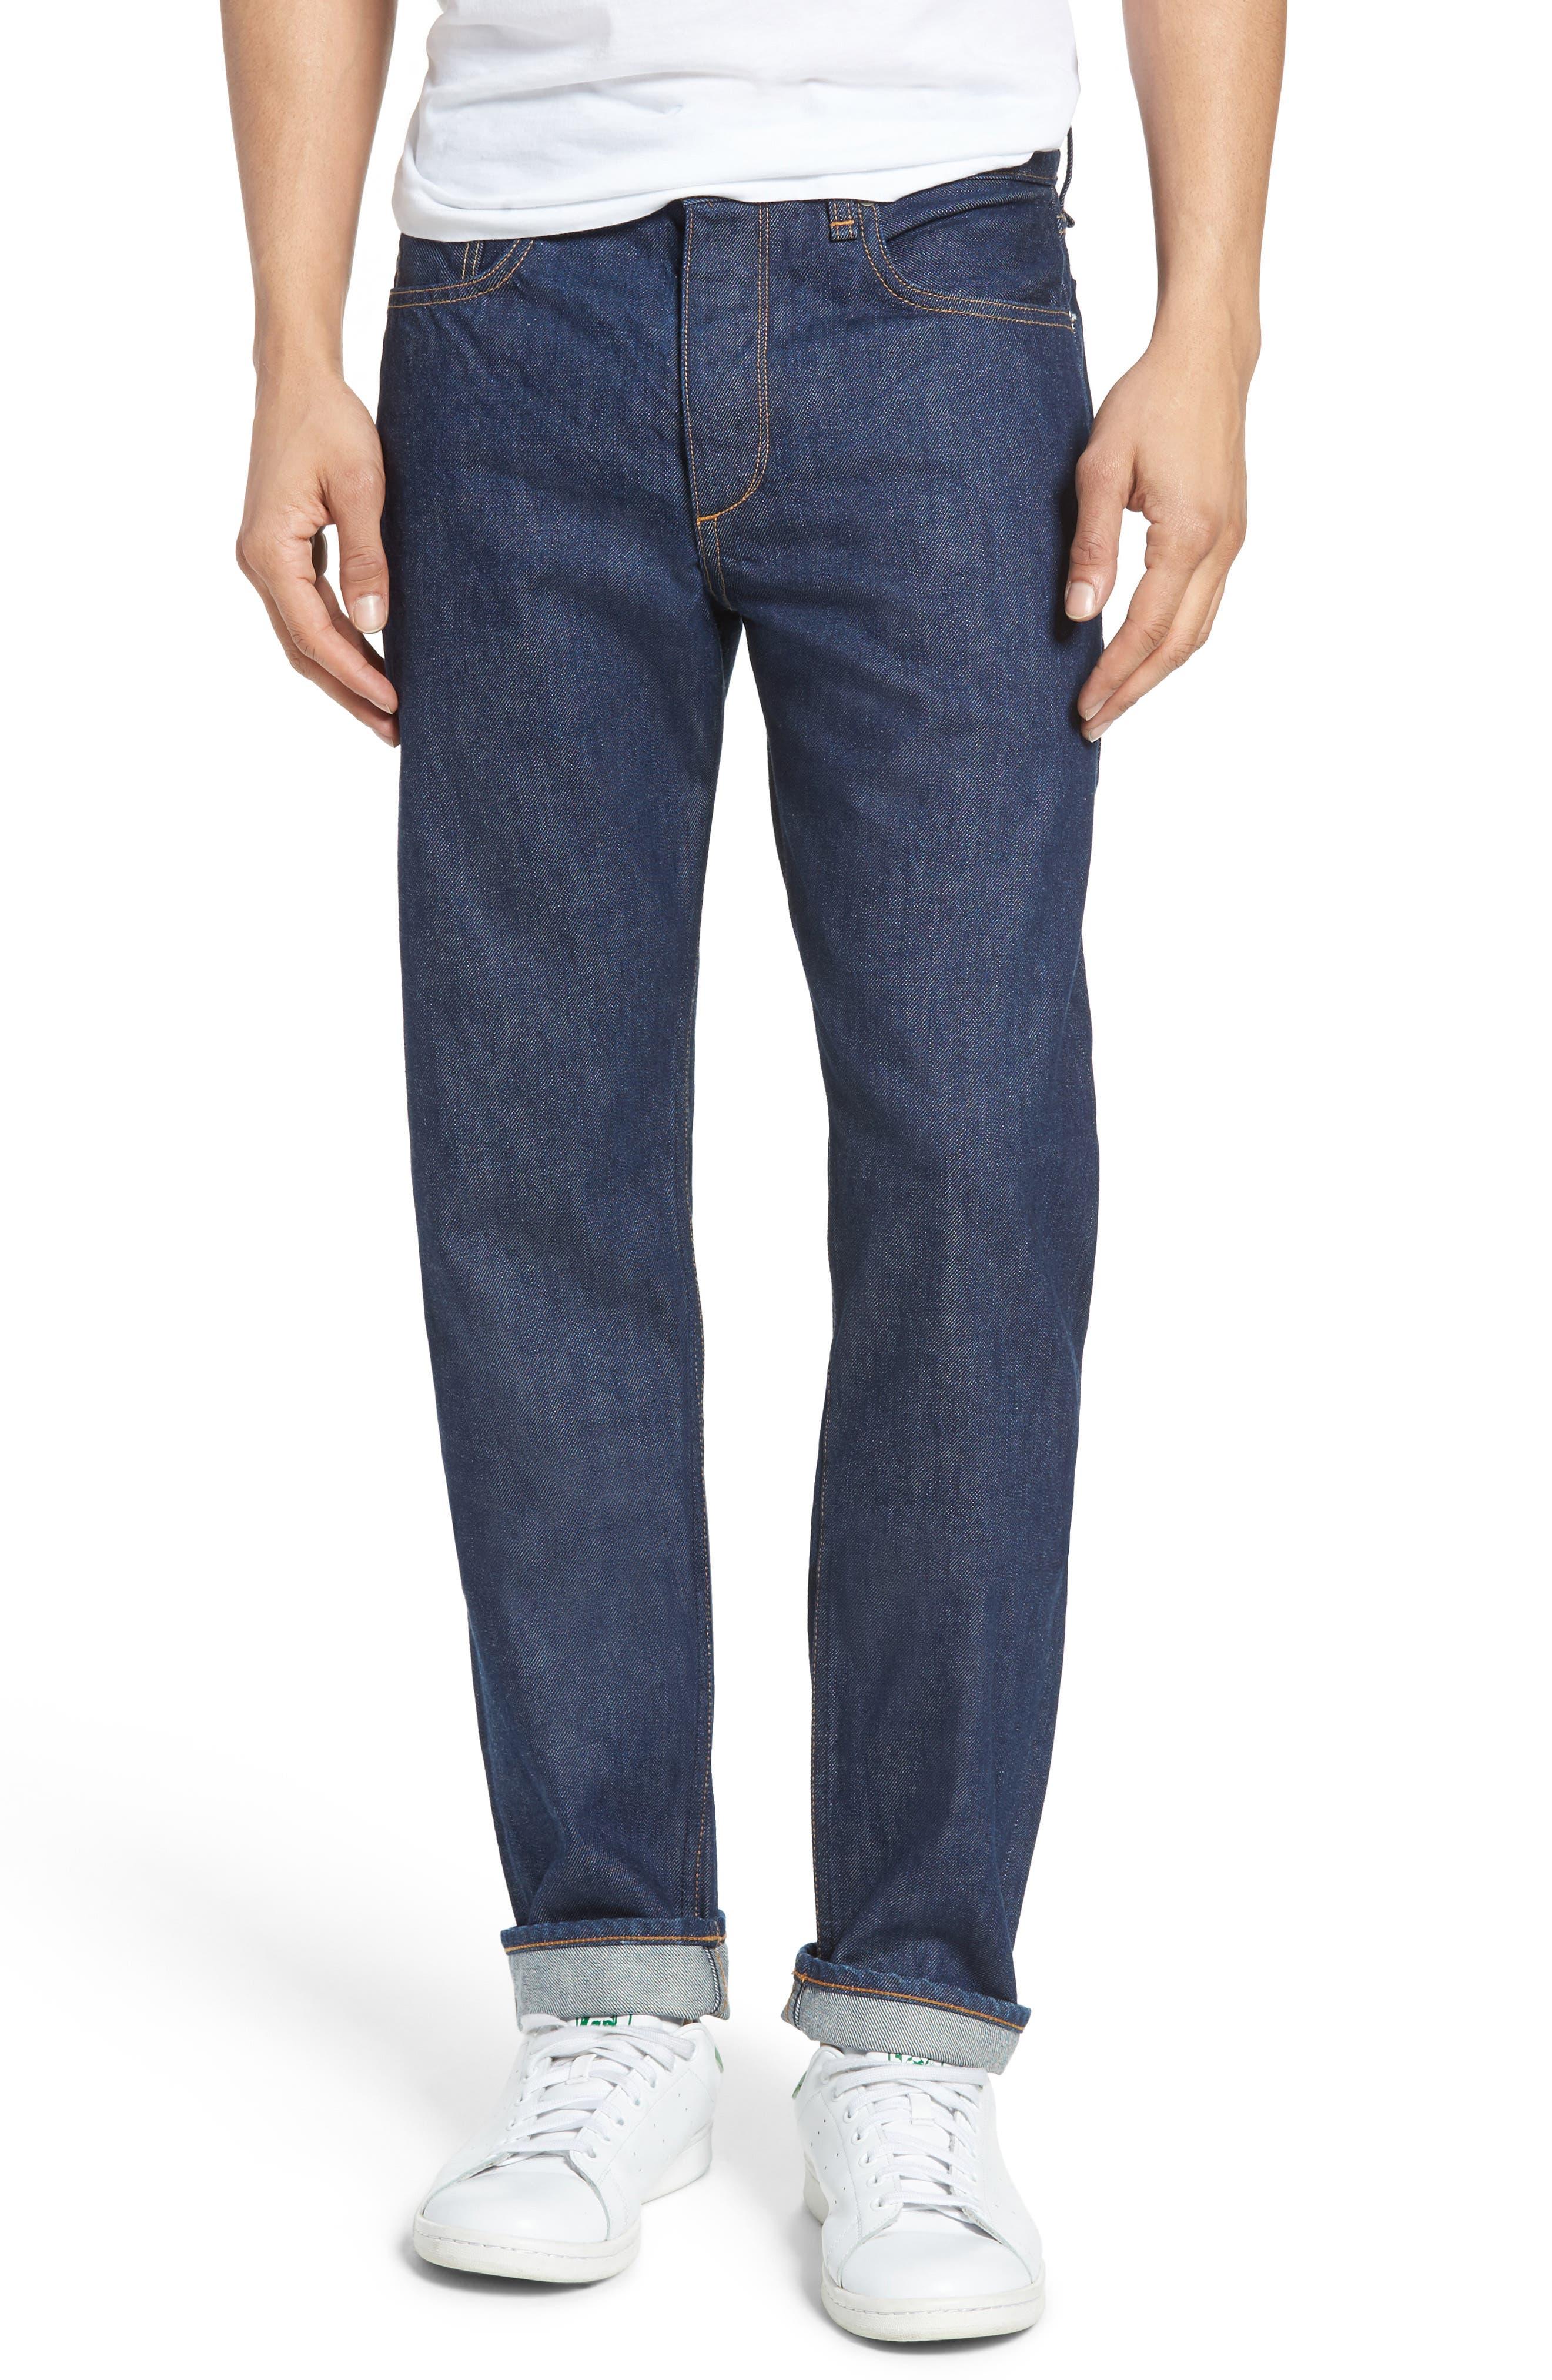 Fit 2 Slim Fit Selvedge Jeans,                         Main,                         color, 427